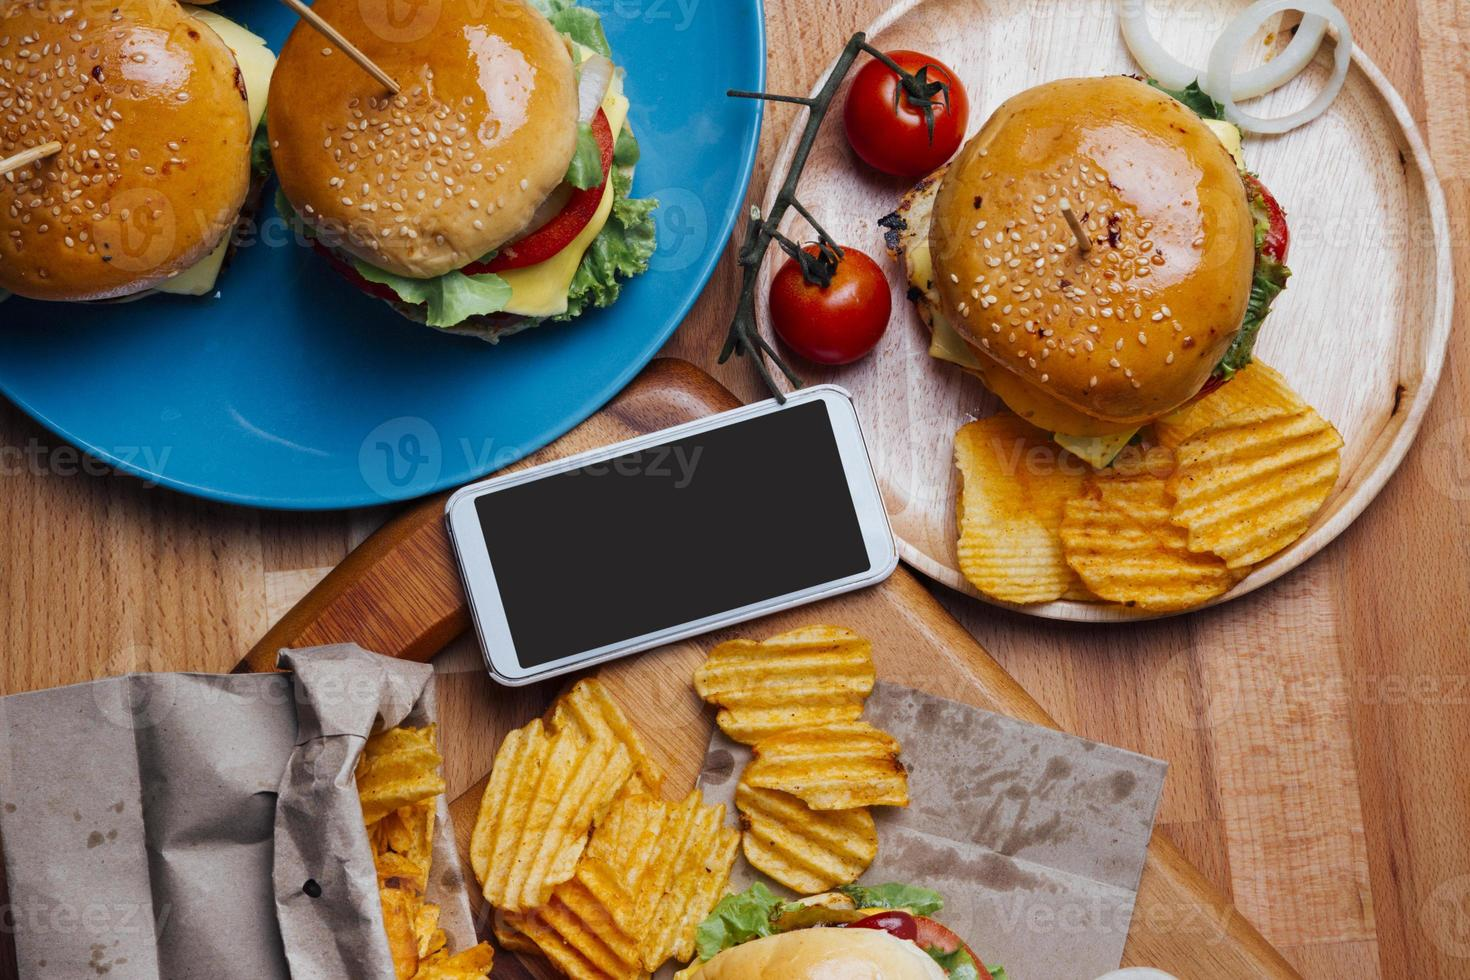 Hamburgers with moblie phone photo